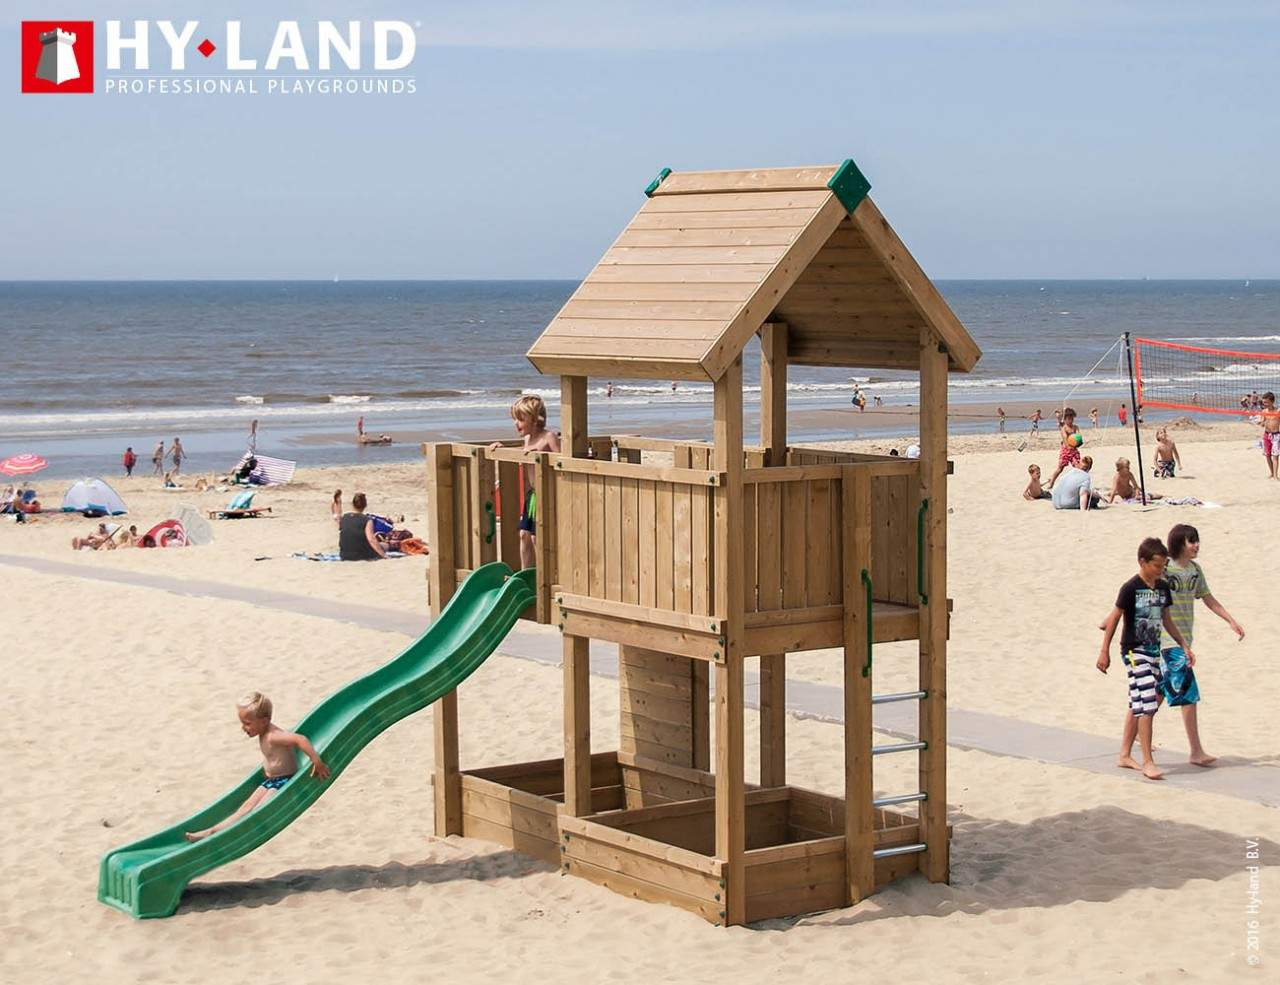 15 103 100 00 Hy land P3 green slide IIaPUAJYZRv9TPa 1280x1280